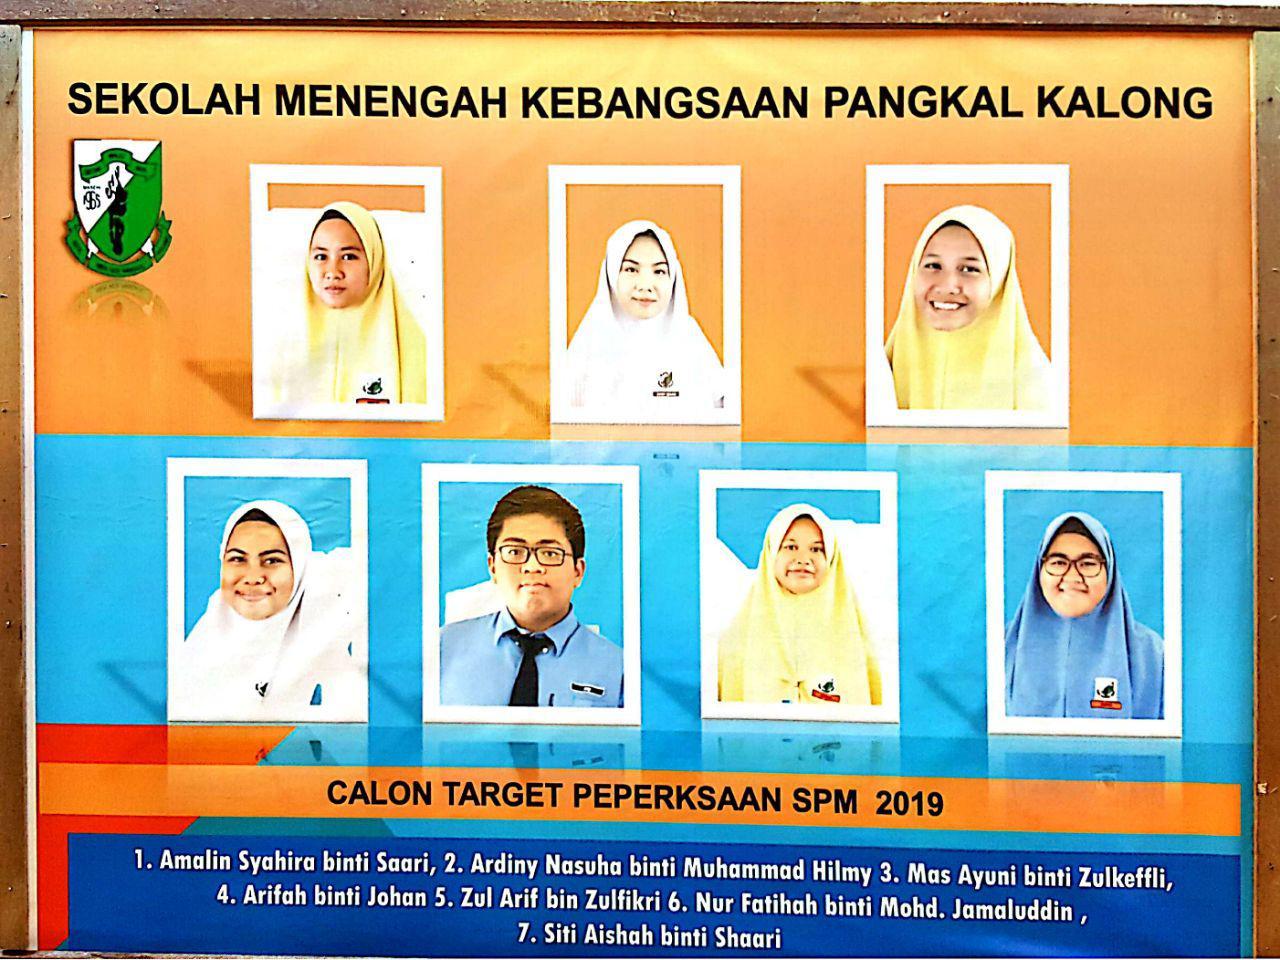 TARGET SPM 2019